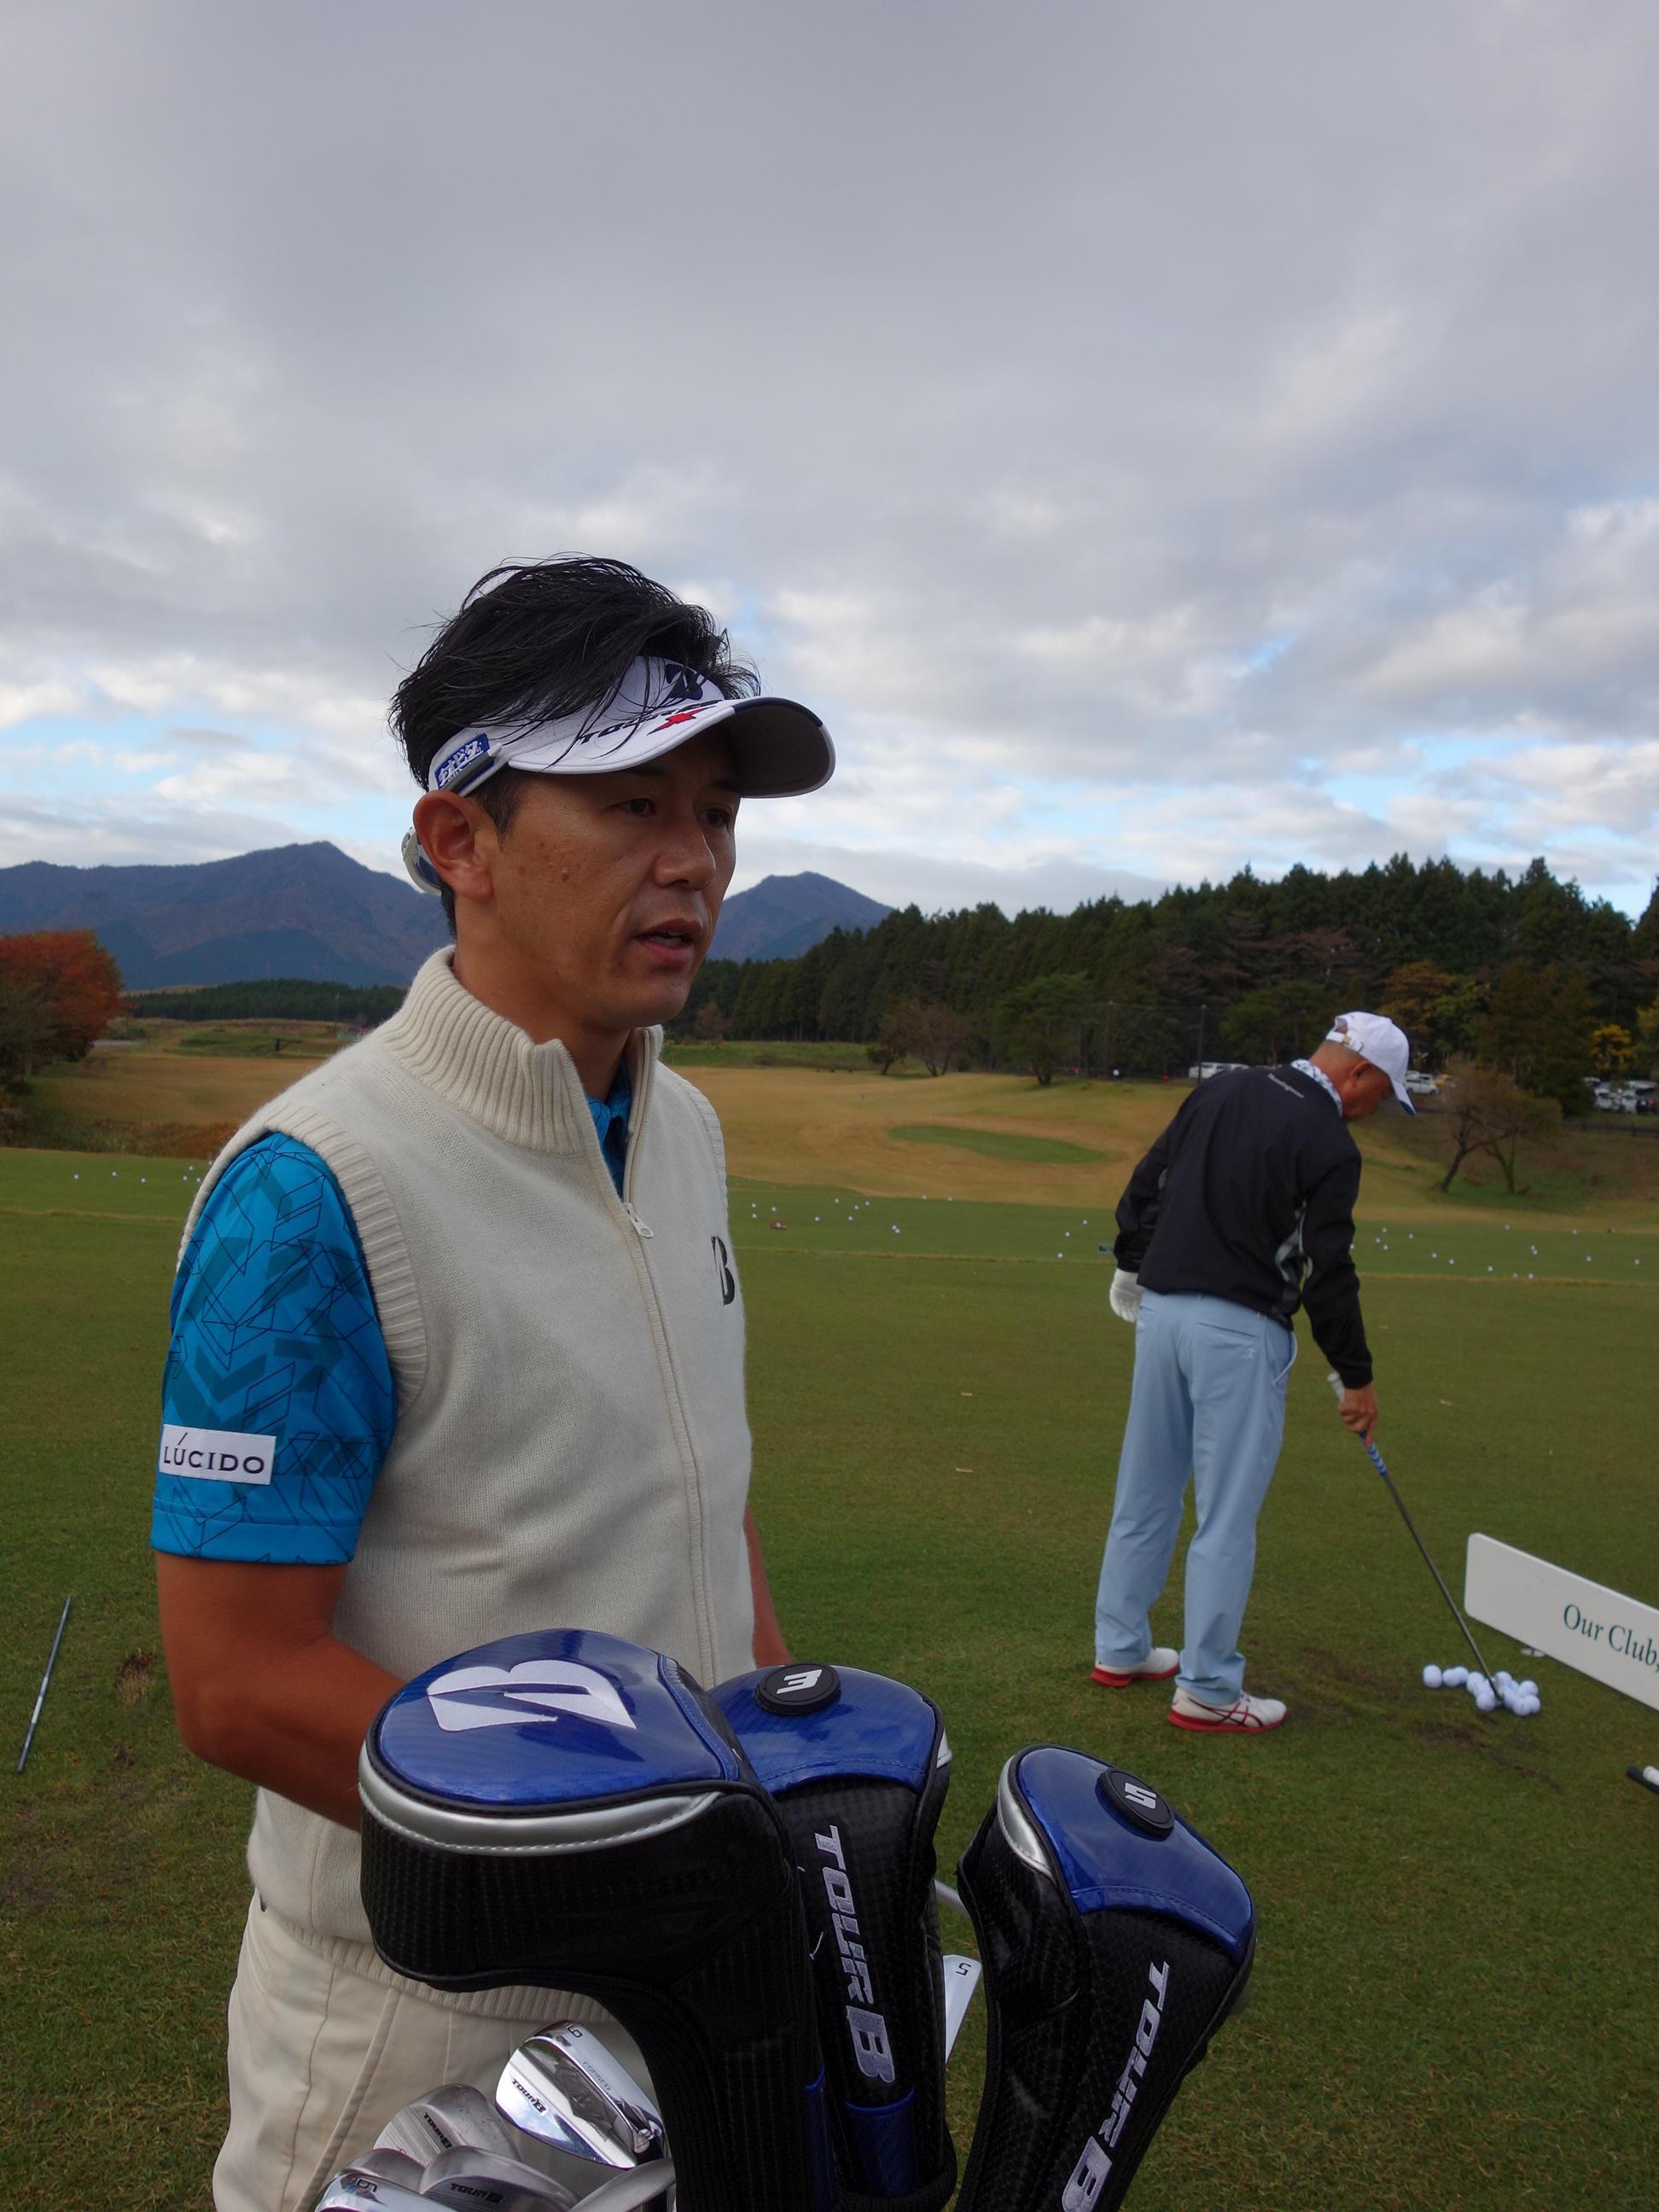 http://www.bs-golf.com/pro/f1c4c49b790ec70c5781324e475487fc0452c970.JPG